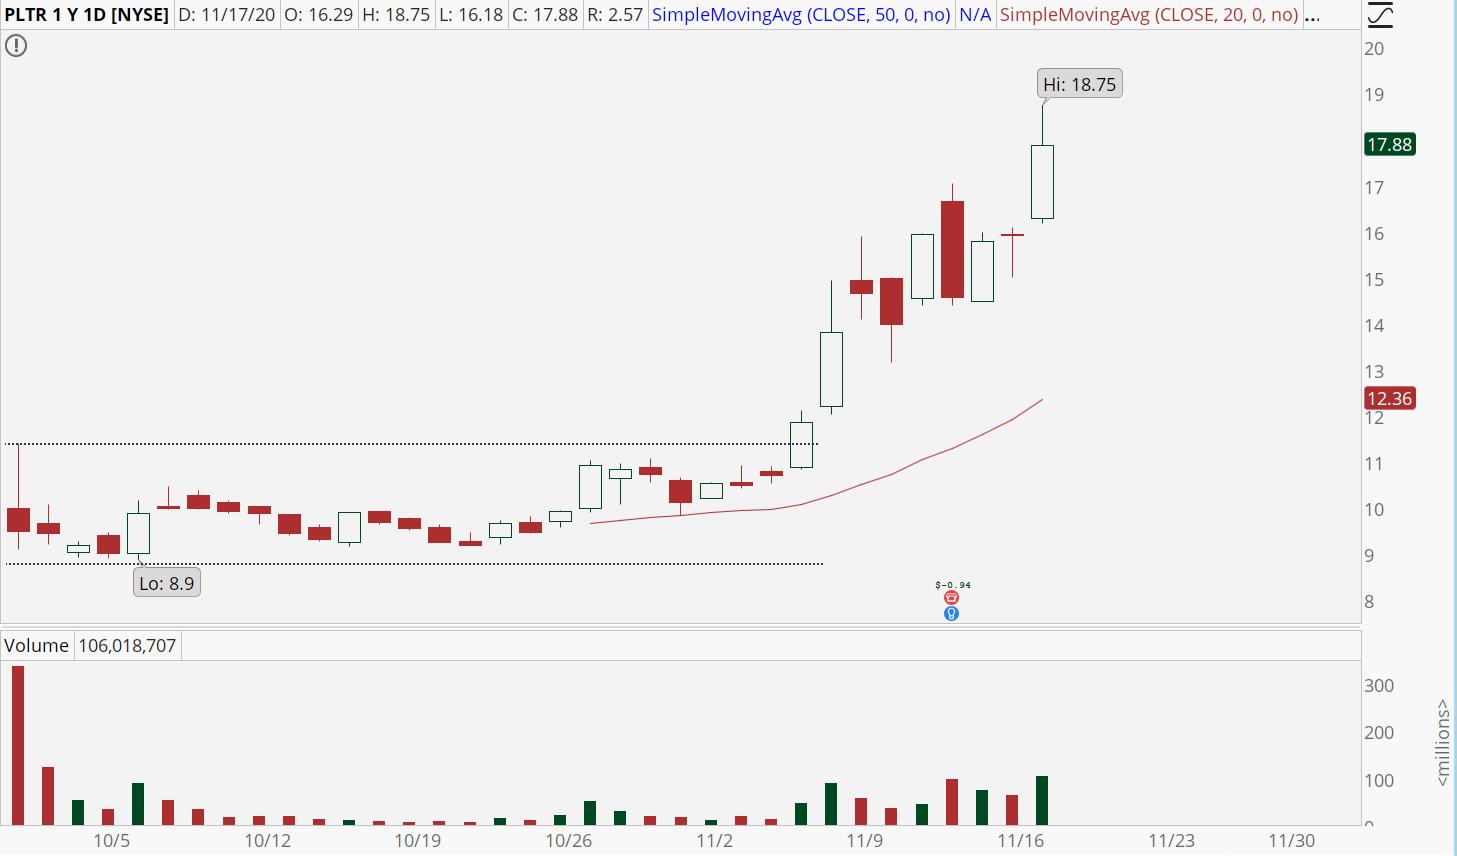 Palantir (PLTR) stock with powerful momentum